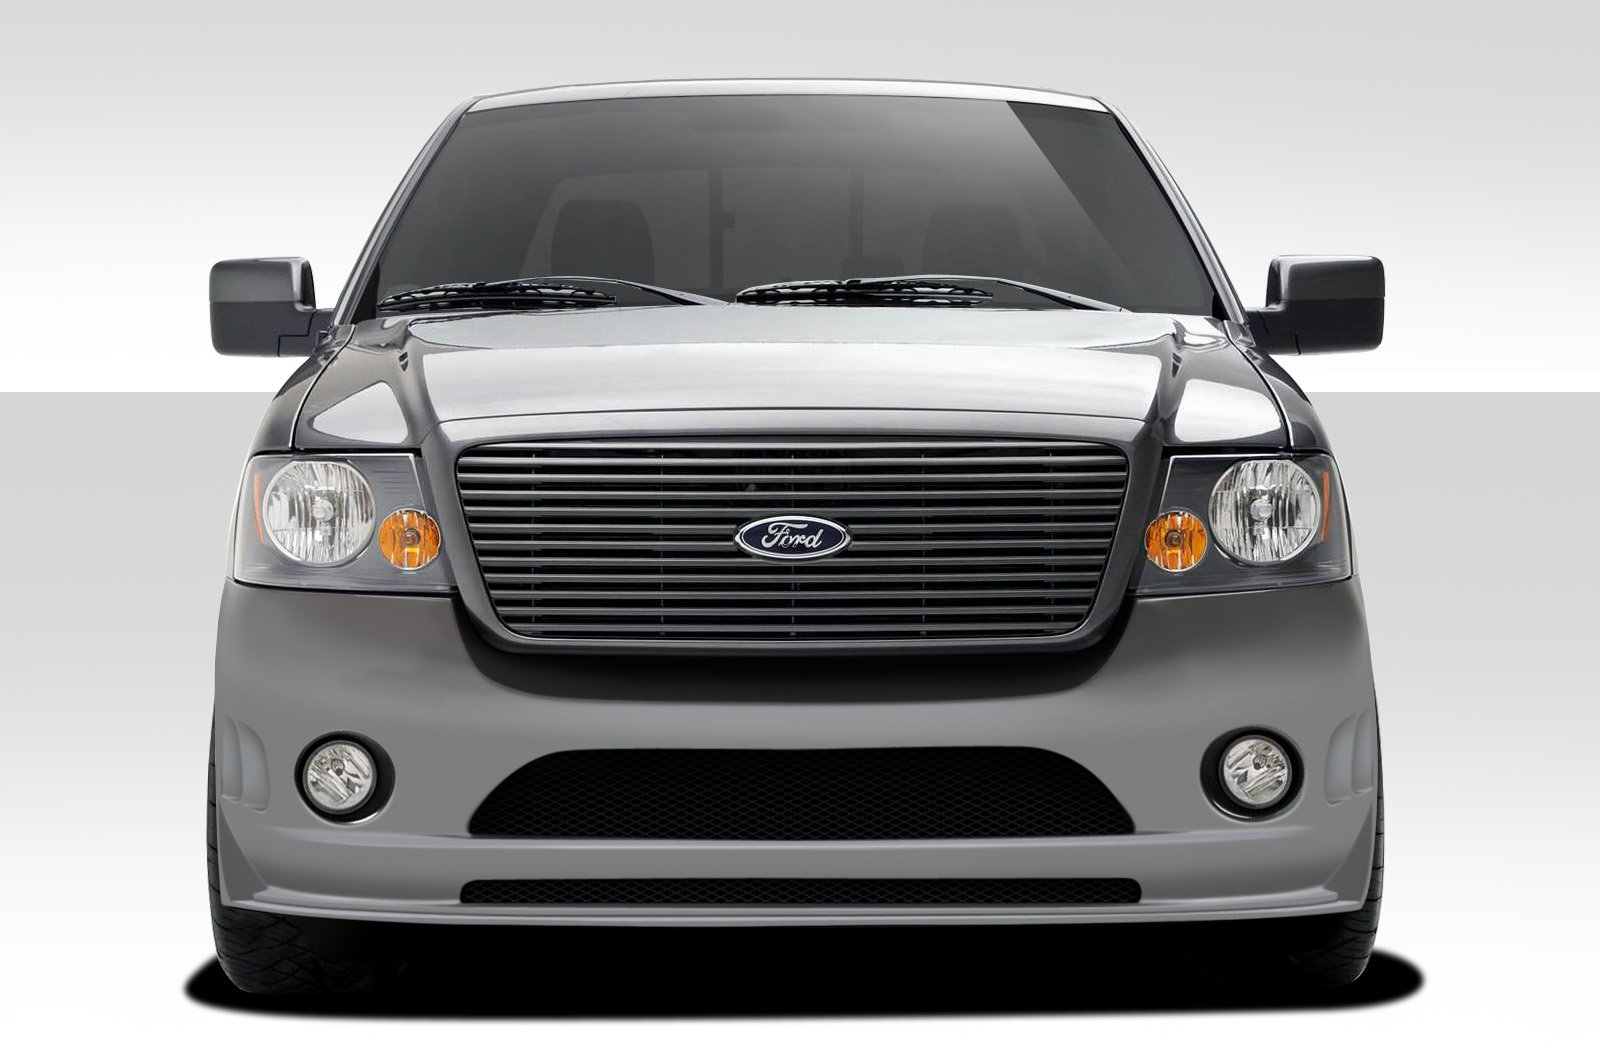 04 08 Ford F150 Bt 2 Duraflex Front Body Kit Bumper